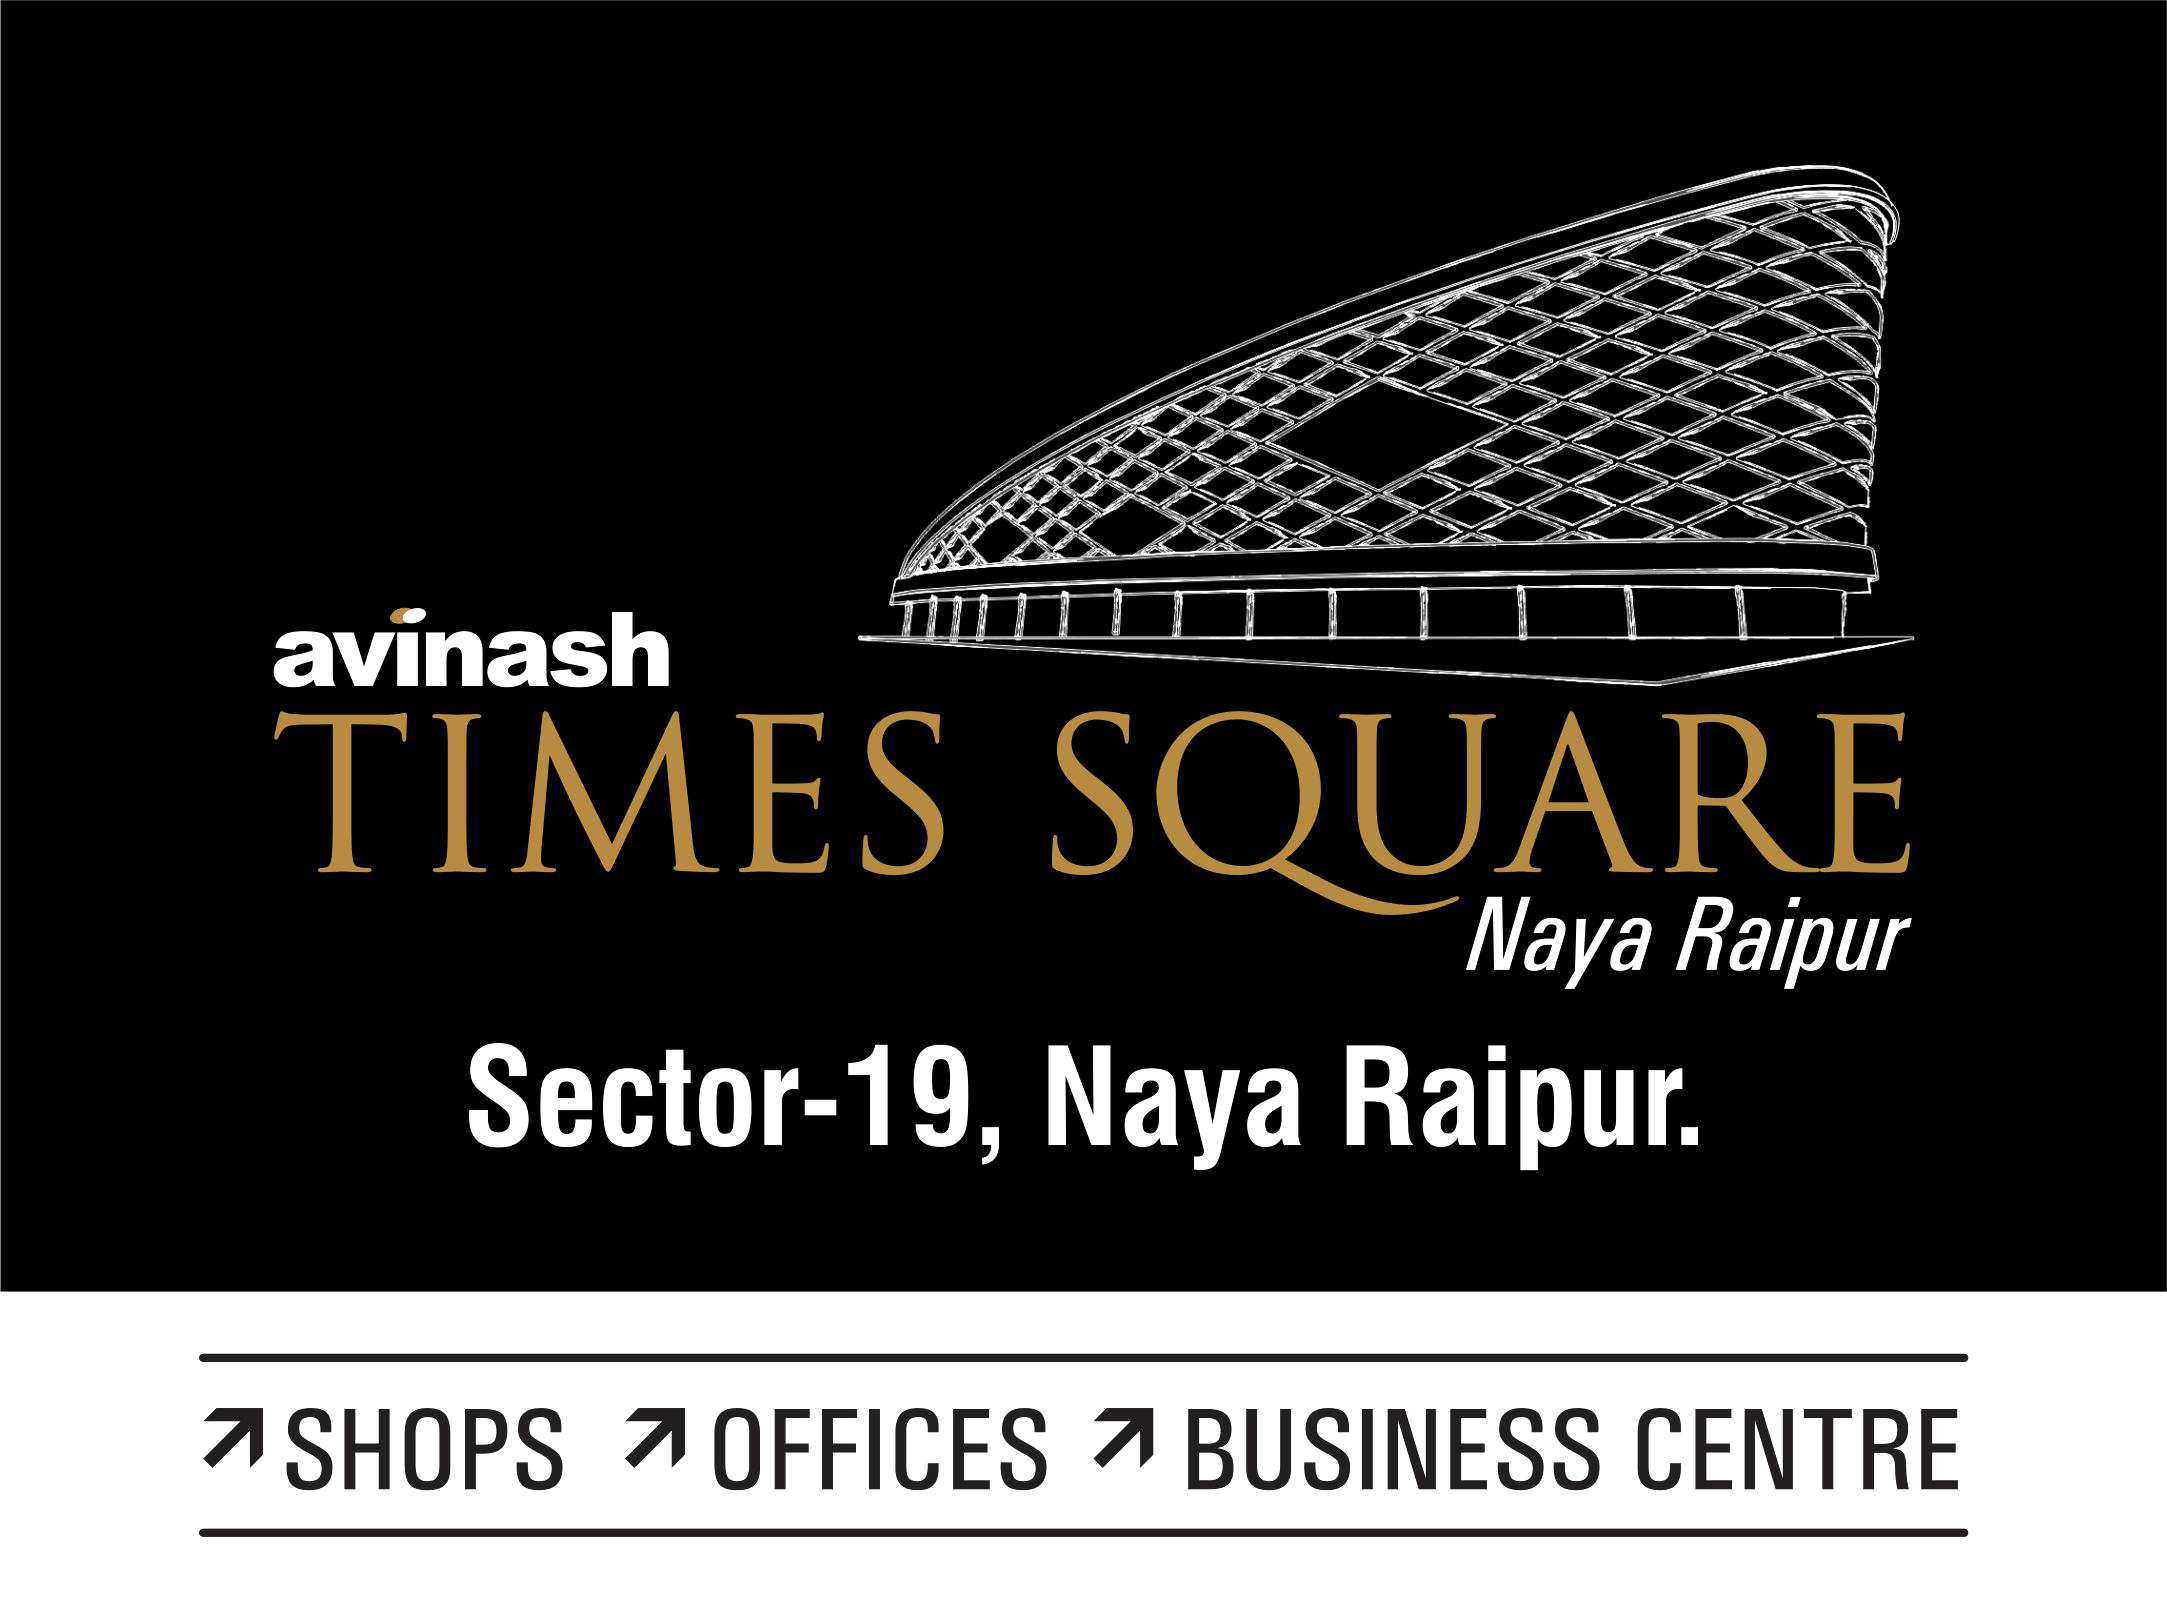 LOGO - Avinash Times Square